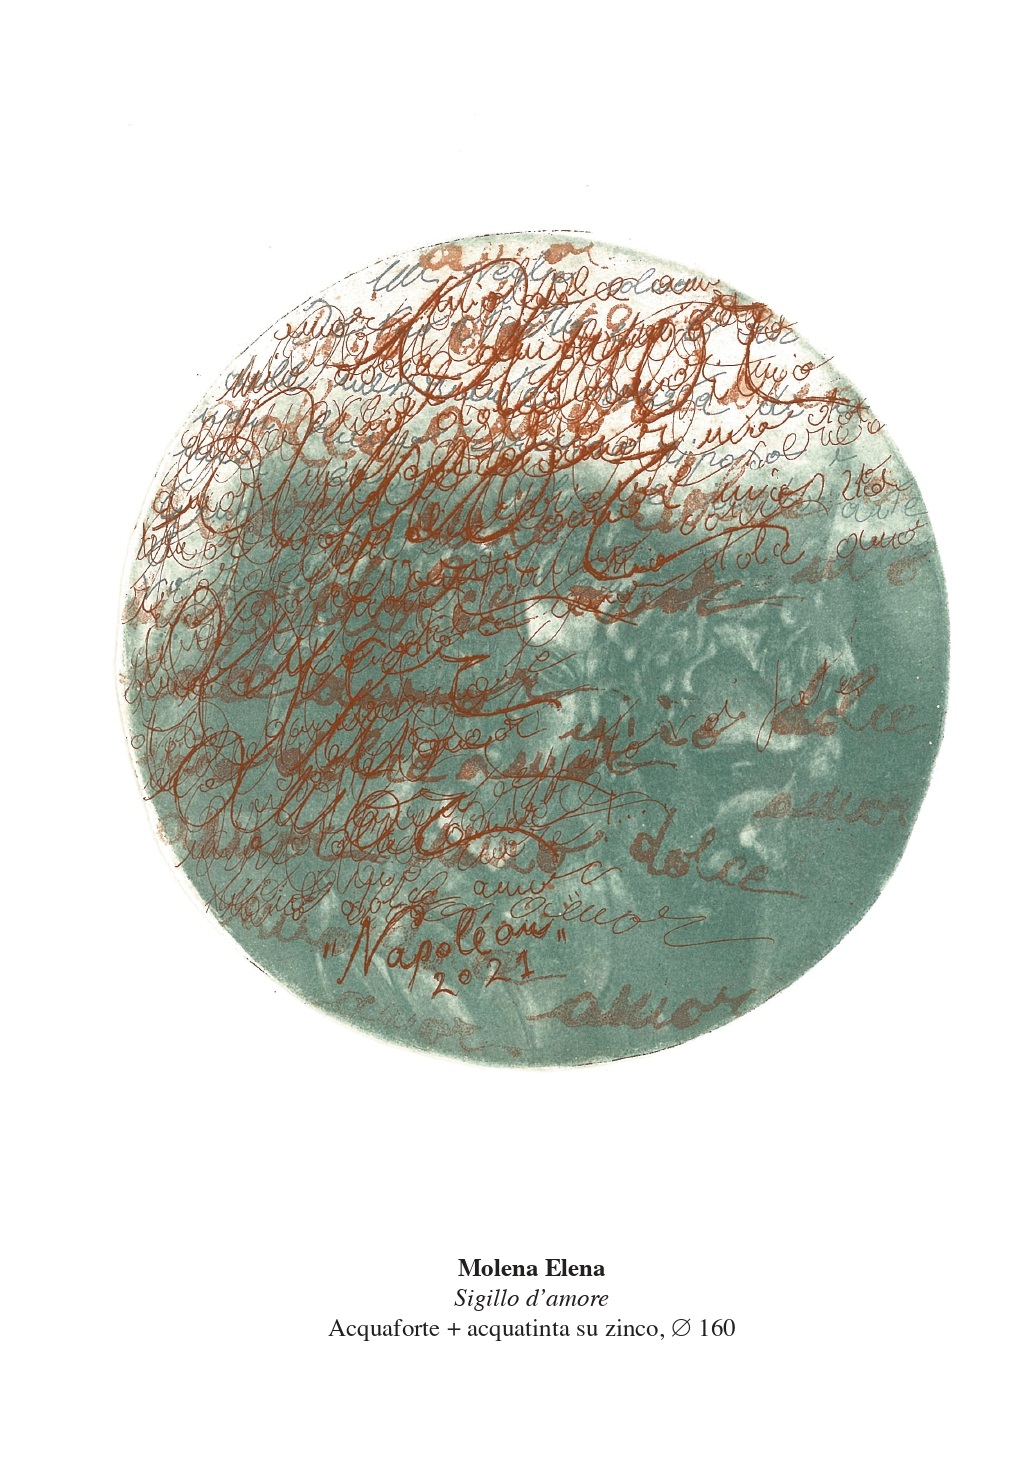 CATALOGO exlibris 2021-108_page-0001